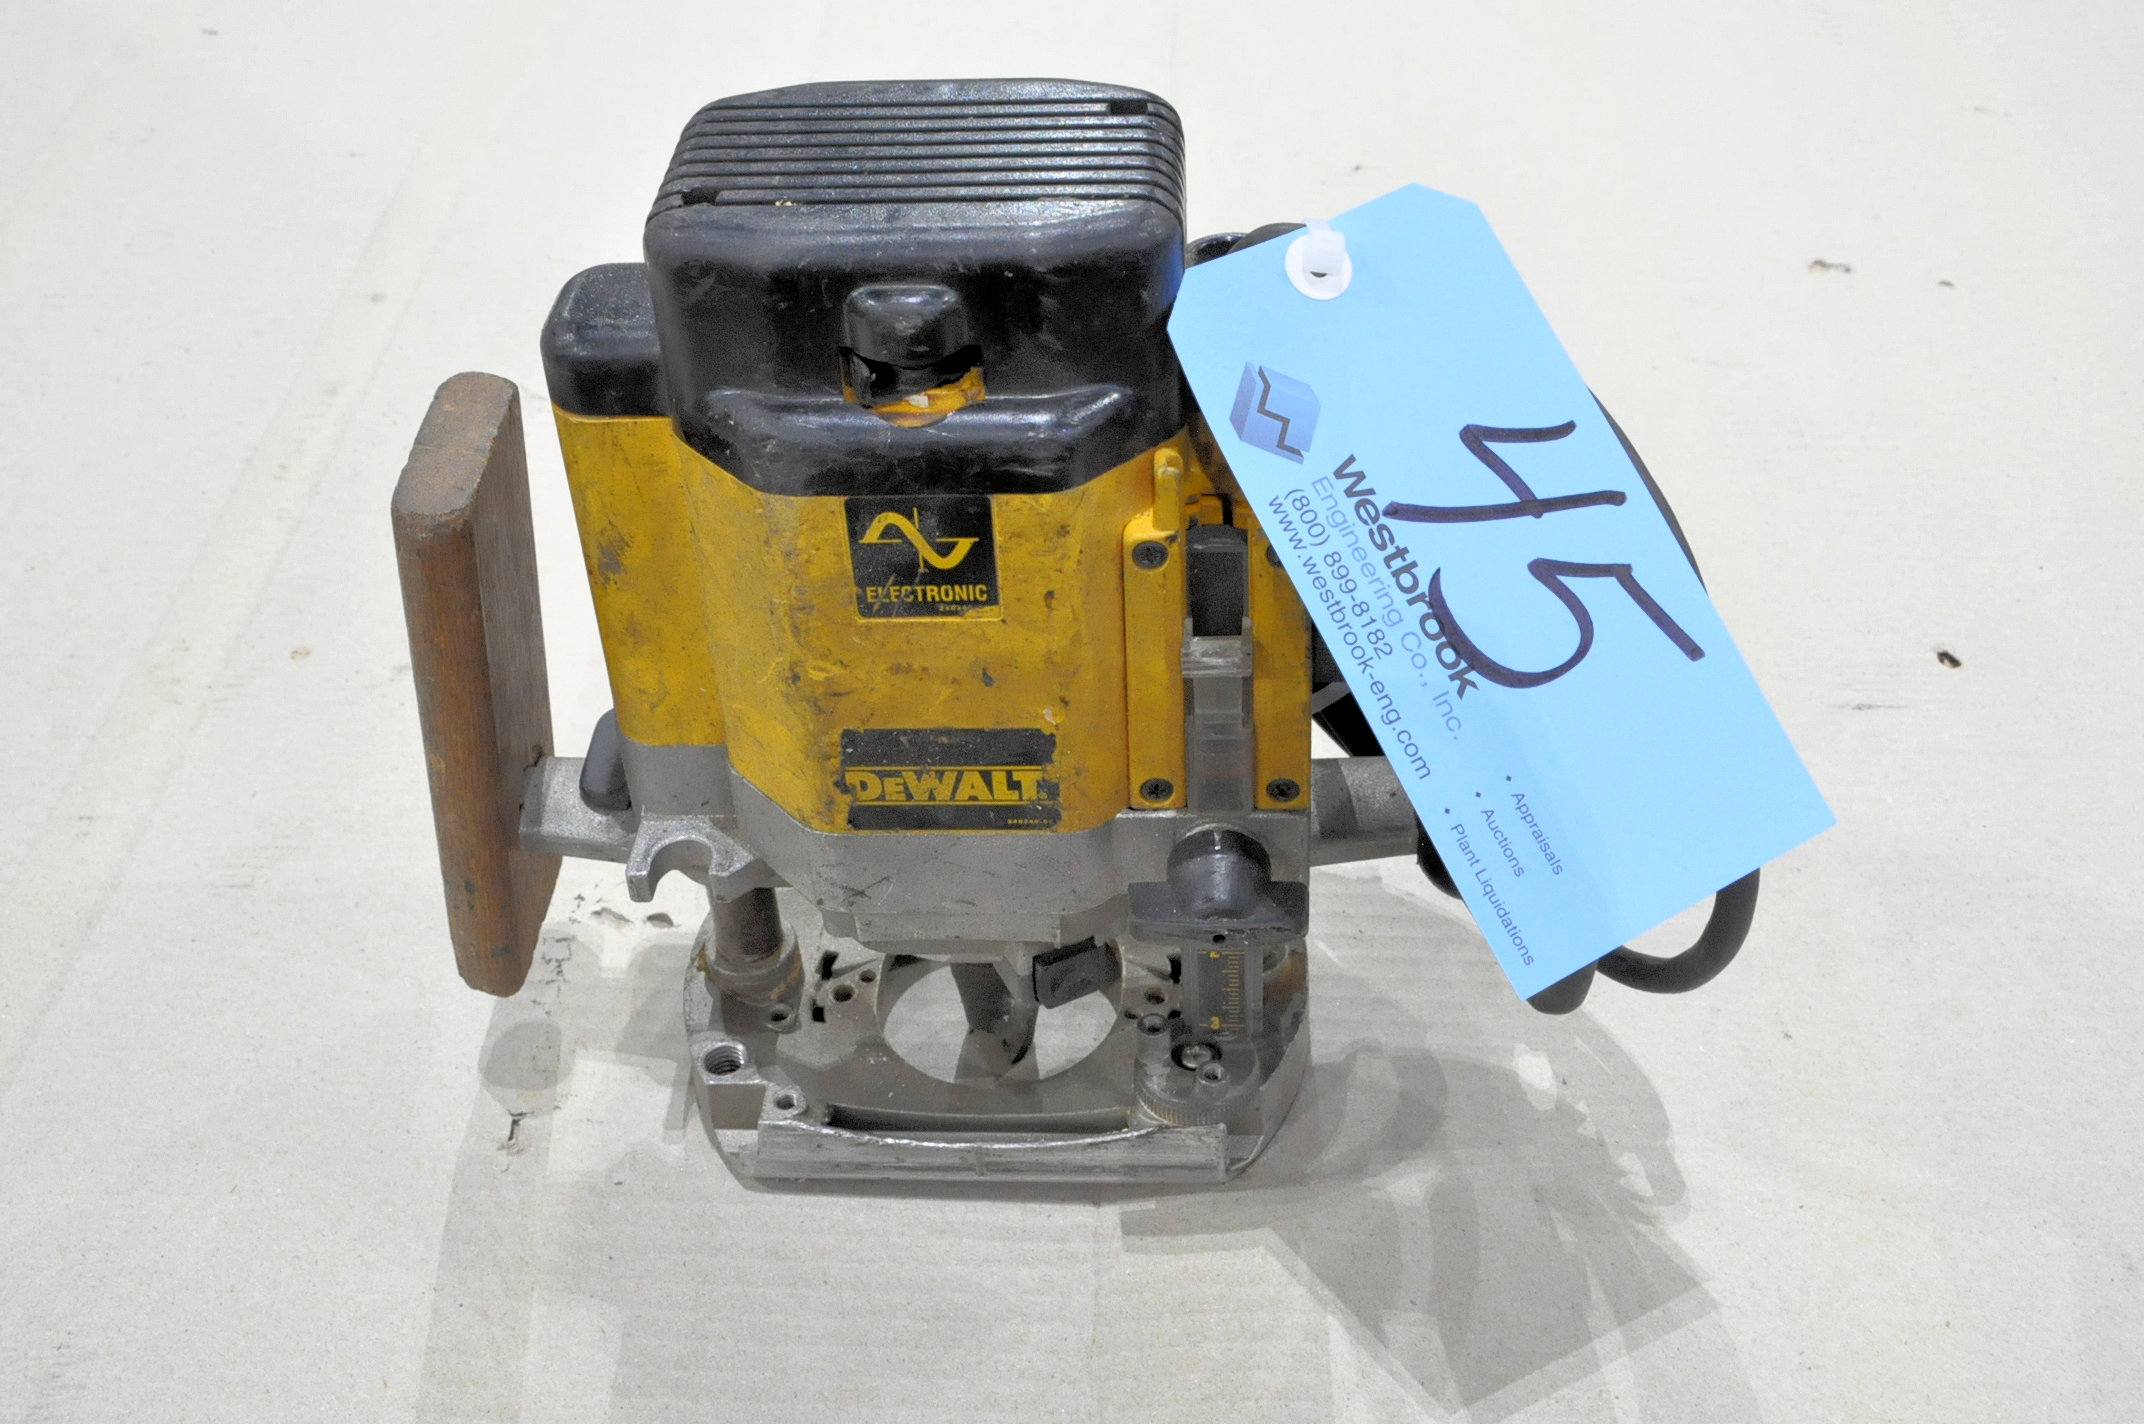 DeWalt Model DW625, 3-HP Router